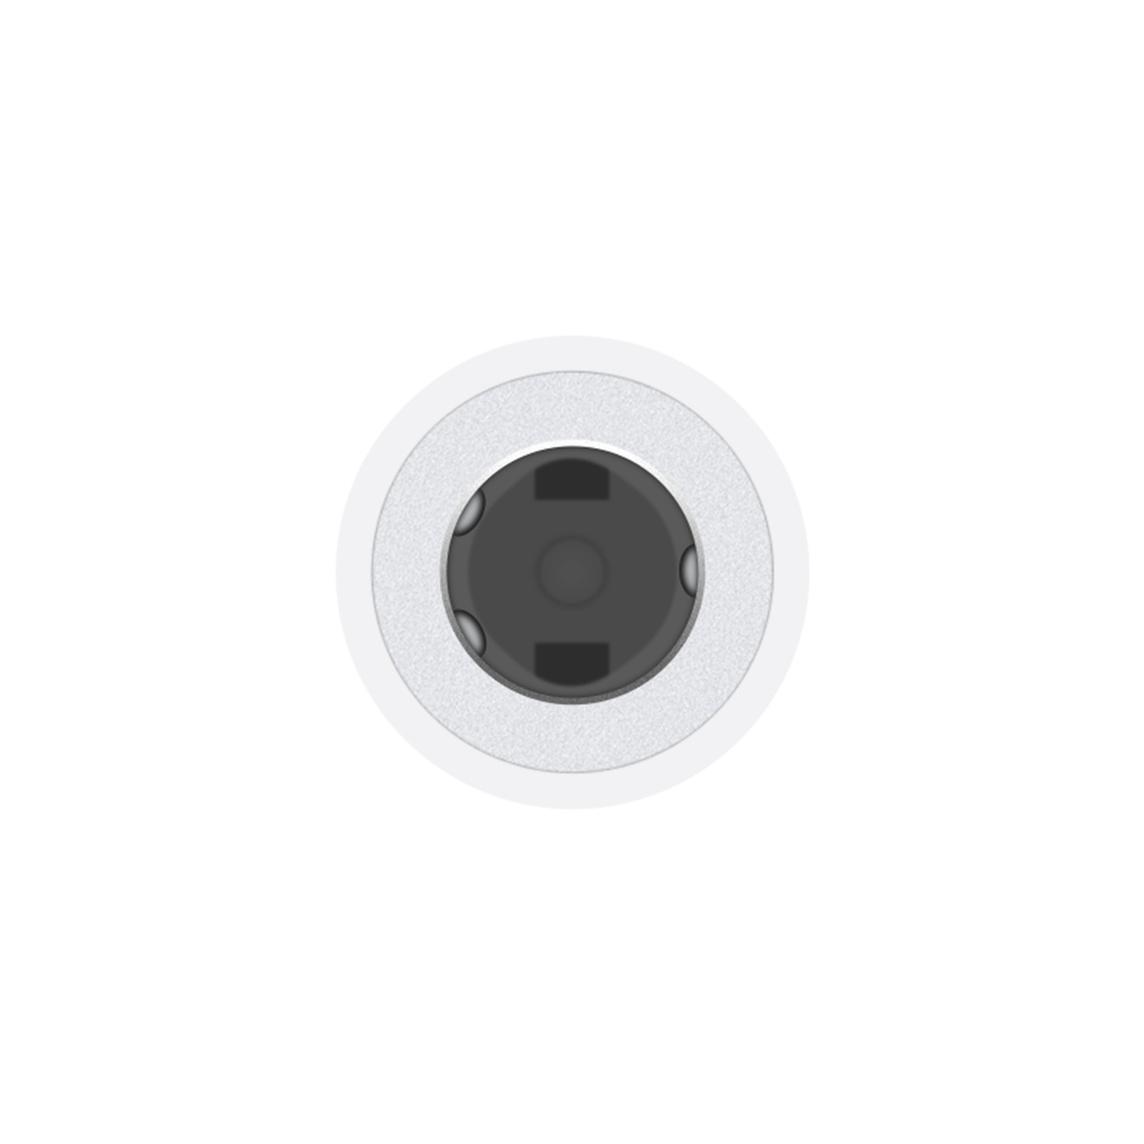 Lightning To 3 5mm Headphone Jack Adapter Apple In